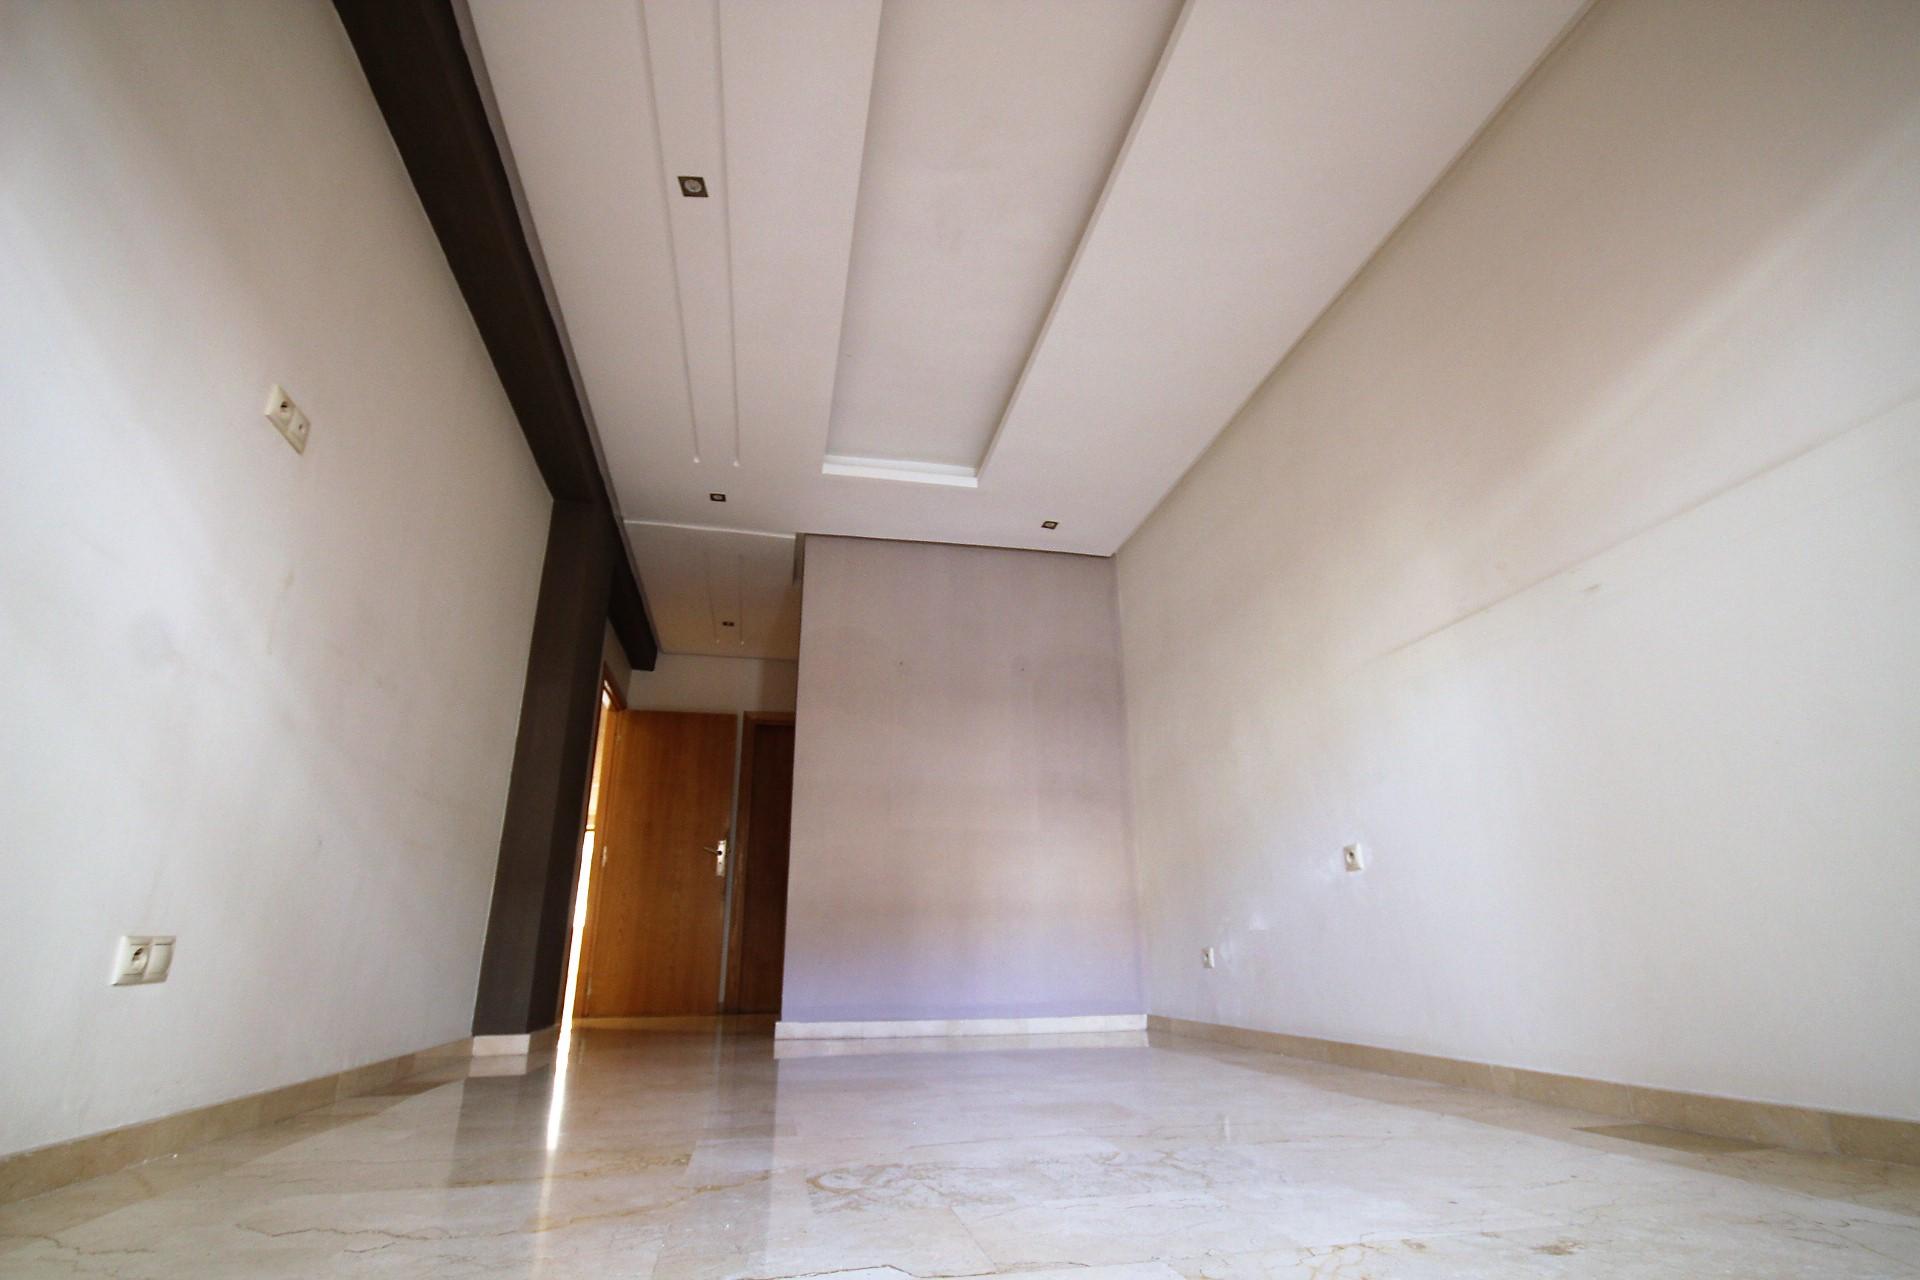 Maroc, Casablanca, Bourgogne proche Badr, loue confortable 100 m²